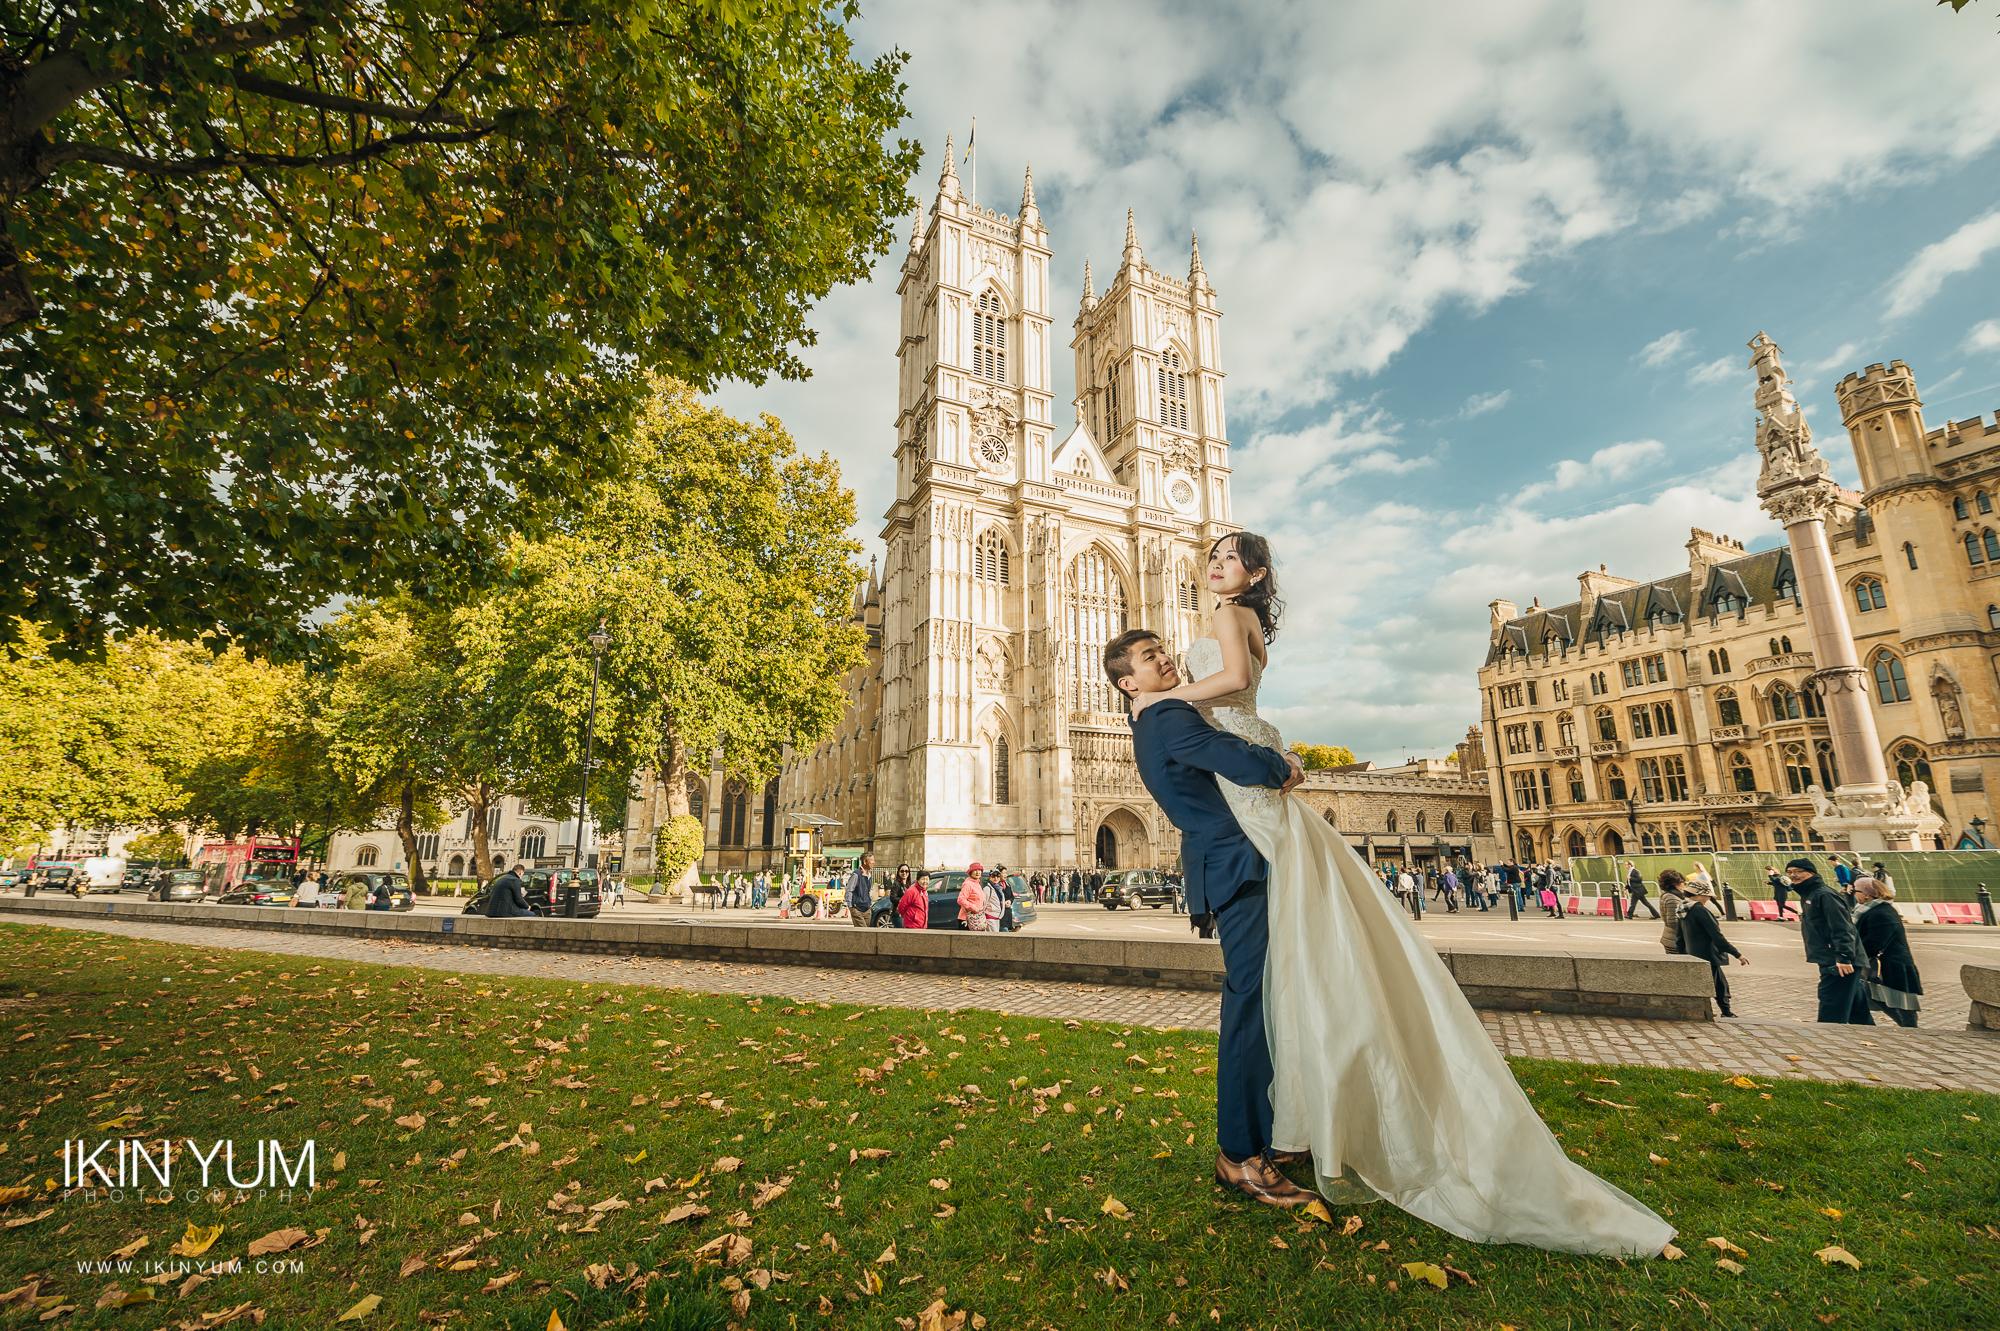 Chloe & Carlos Pre-Wedding Shoot- Ikin Yum Photography-0093.jpg